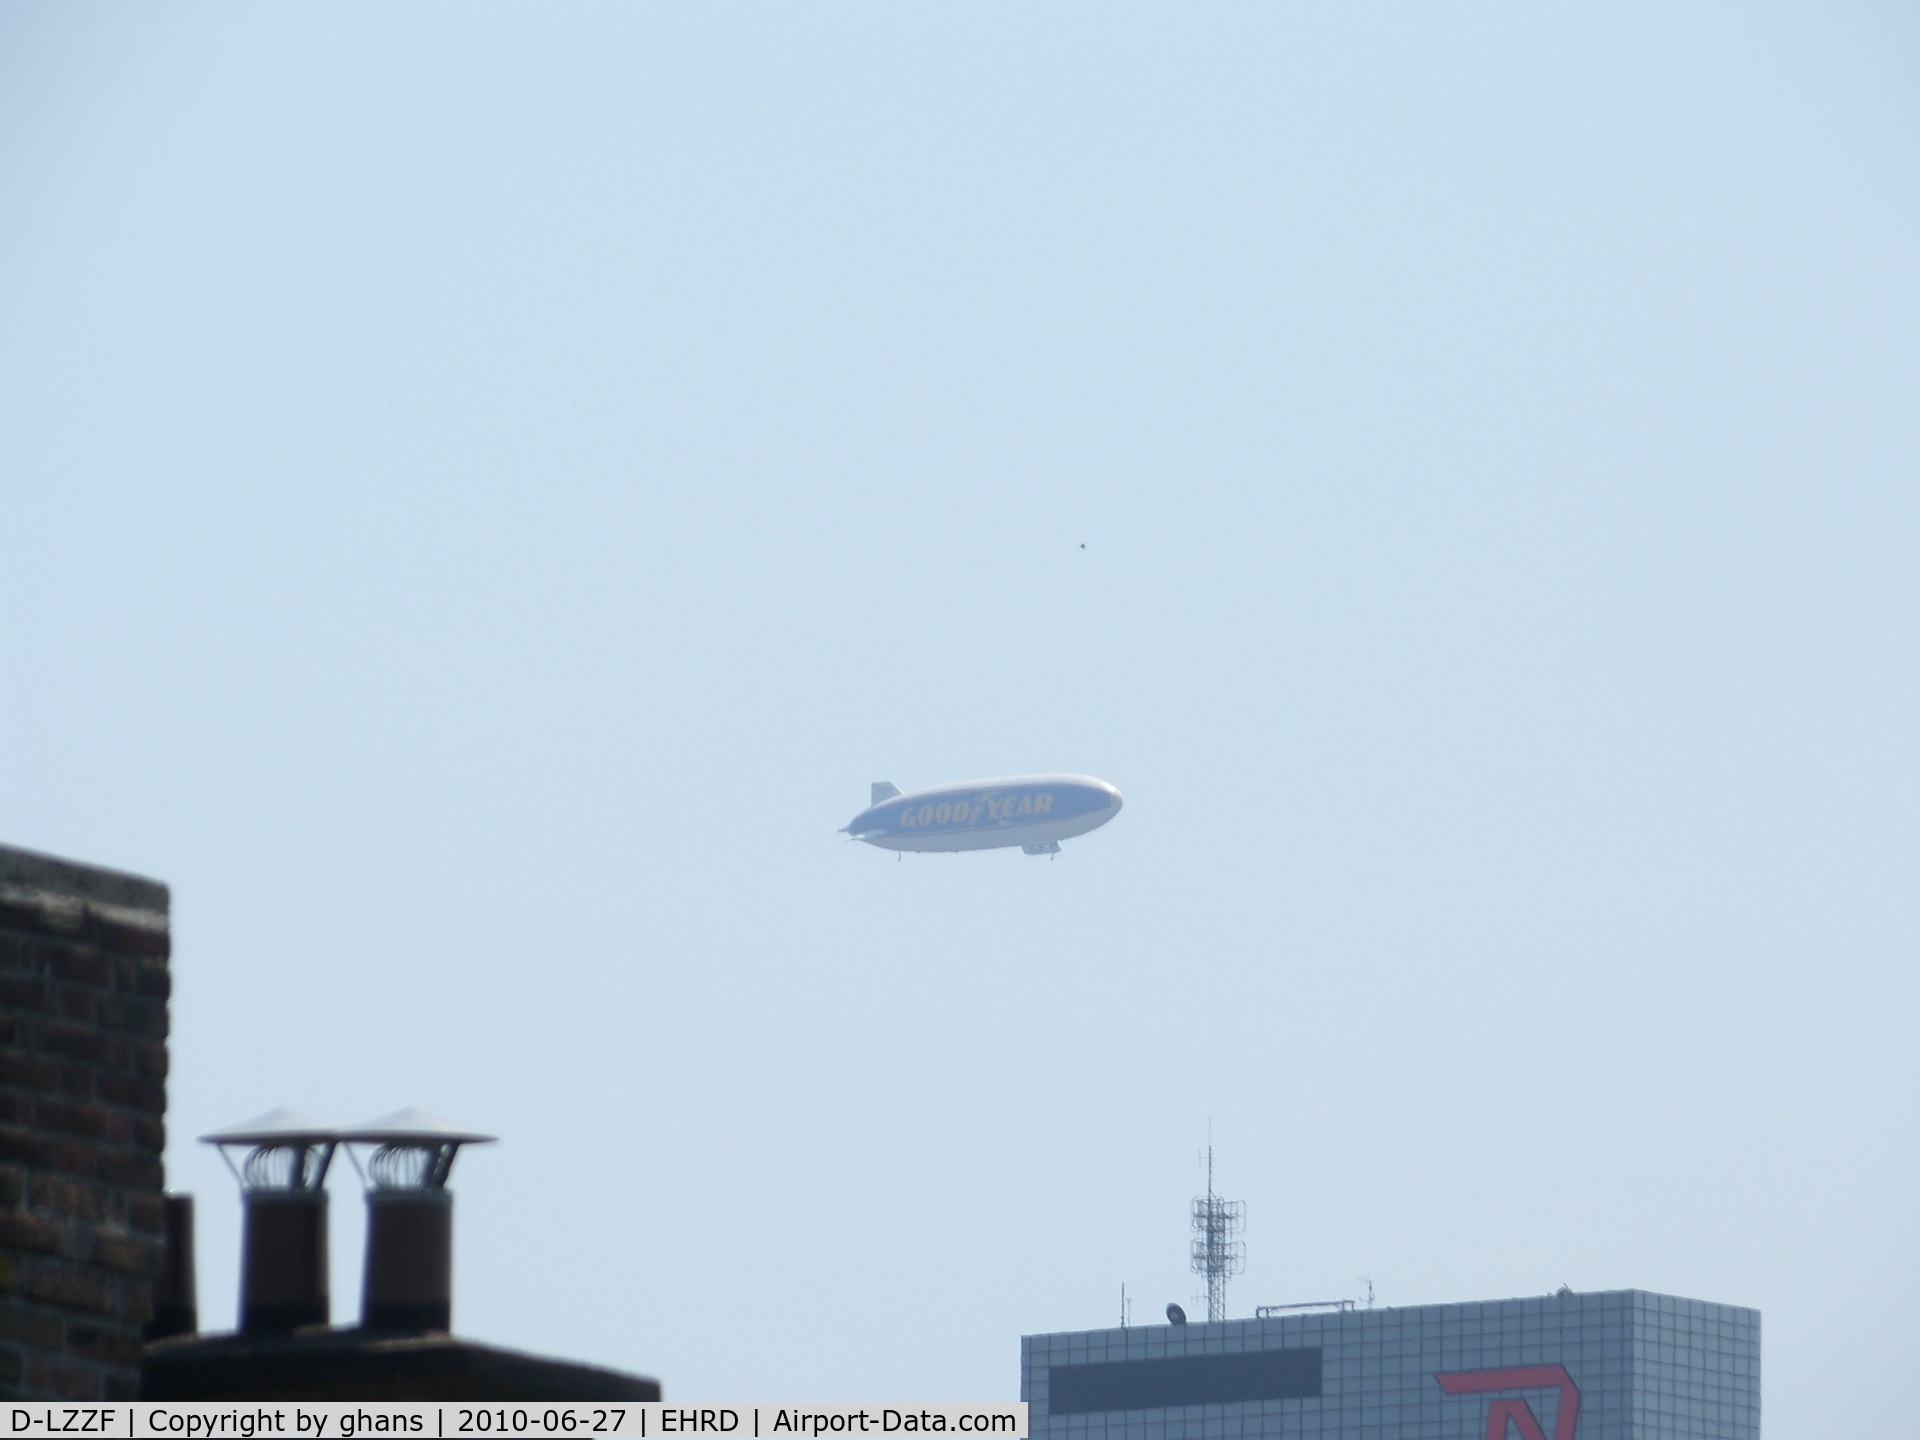 D-LZZF, 1998 Zeppelin LZ-N07 C/N 3, Zeppelin above city of Rotterdam